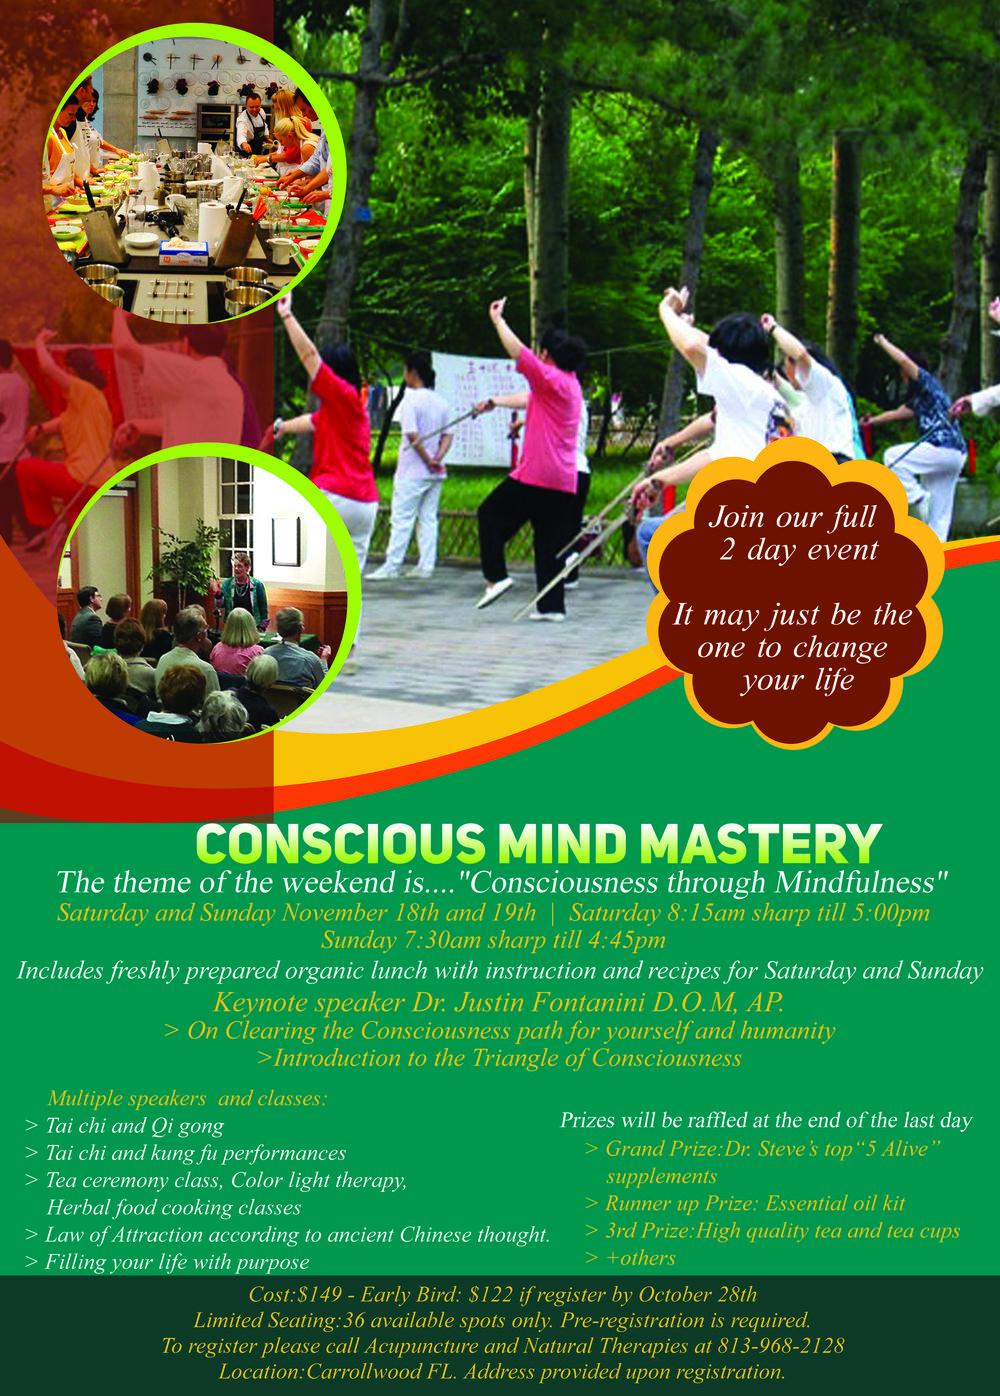 Conscious_Mind_Mastery.jpg